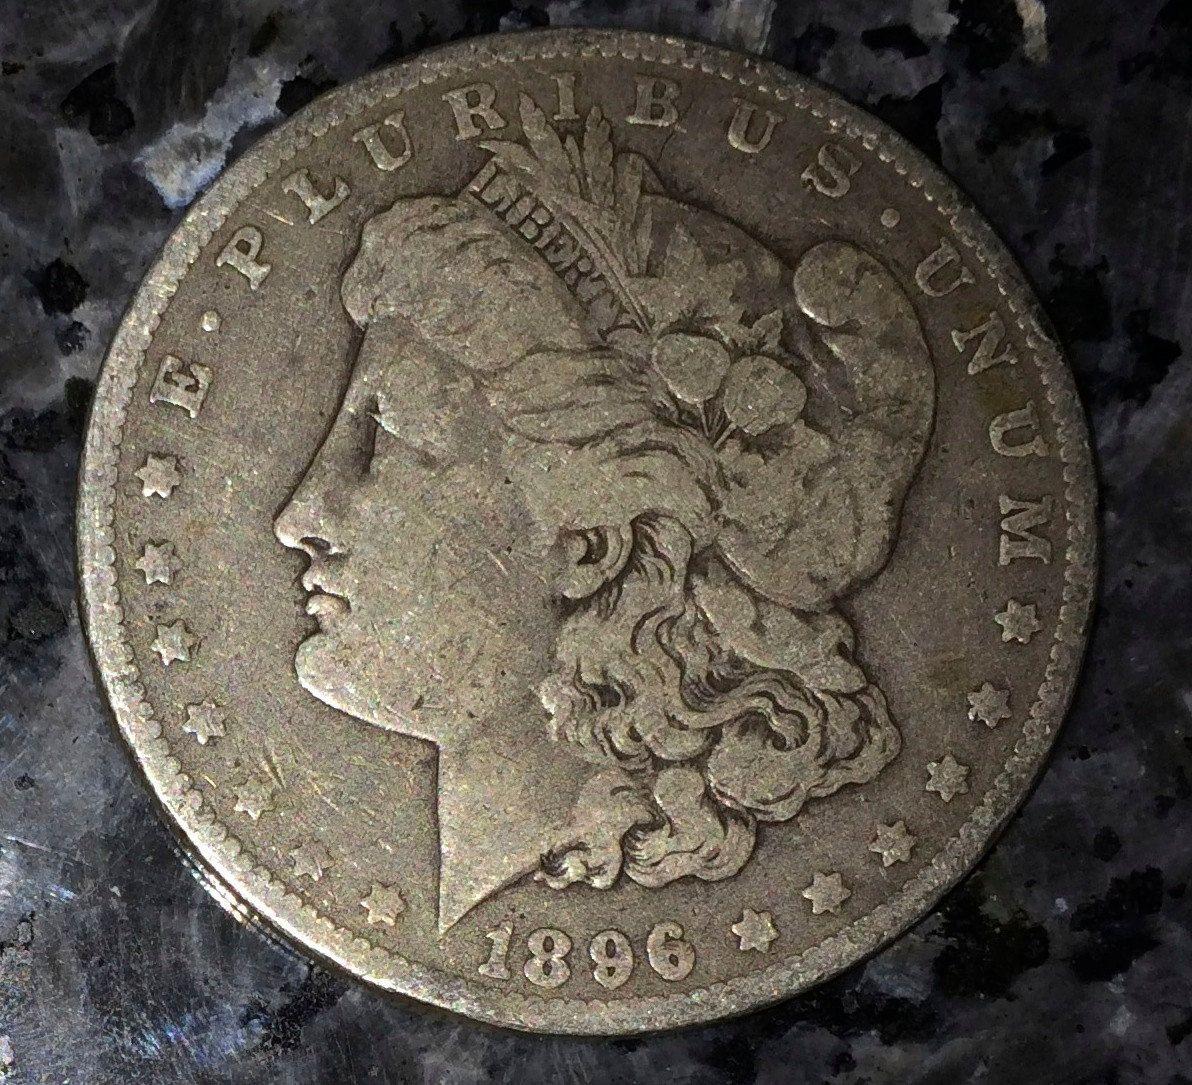 1896 o-US Silver Morgan Silver Dollar- Lady Liberty Coin-Antique Money US  Currency Stars gift idea 90% silver Collectible gift idea